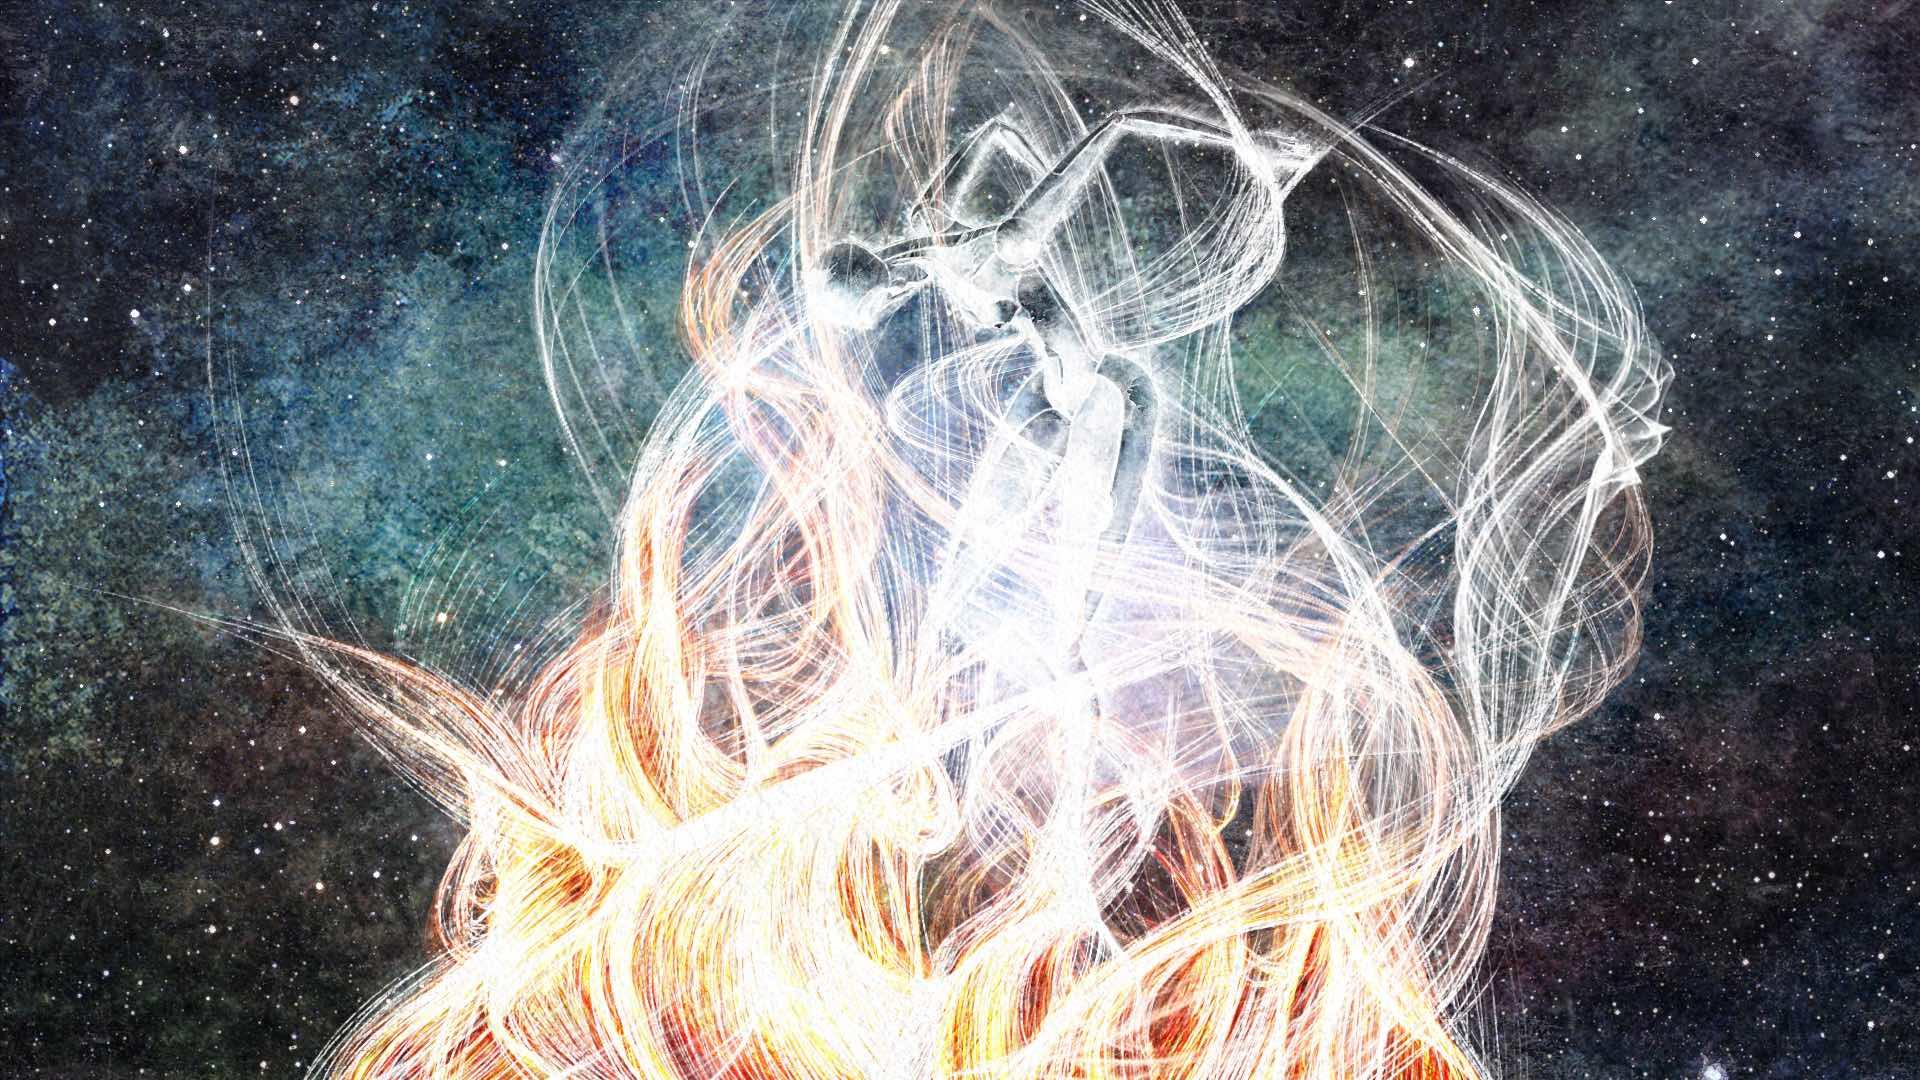 Firebird_Short_Film_Velislava_Gospodinova